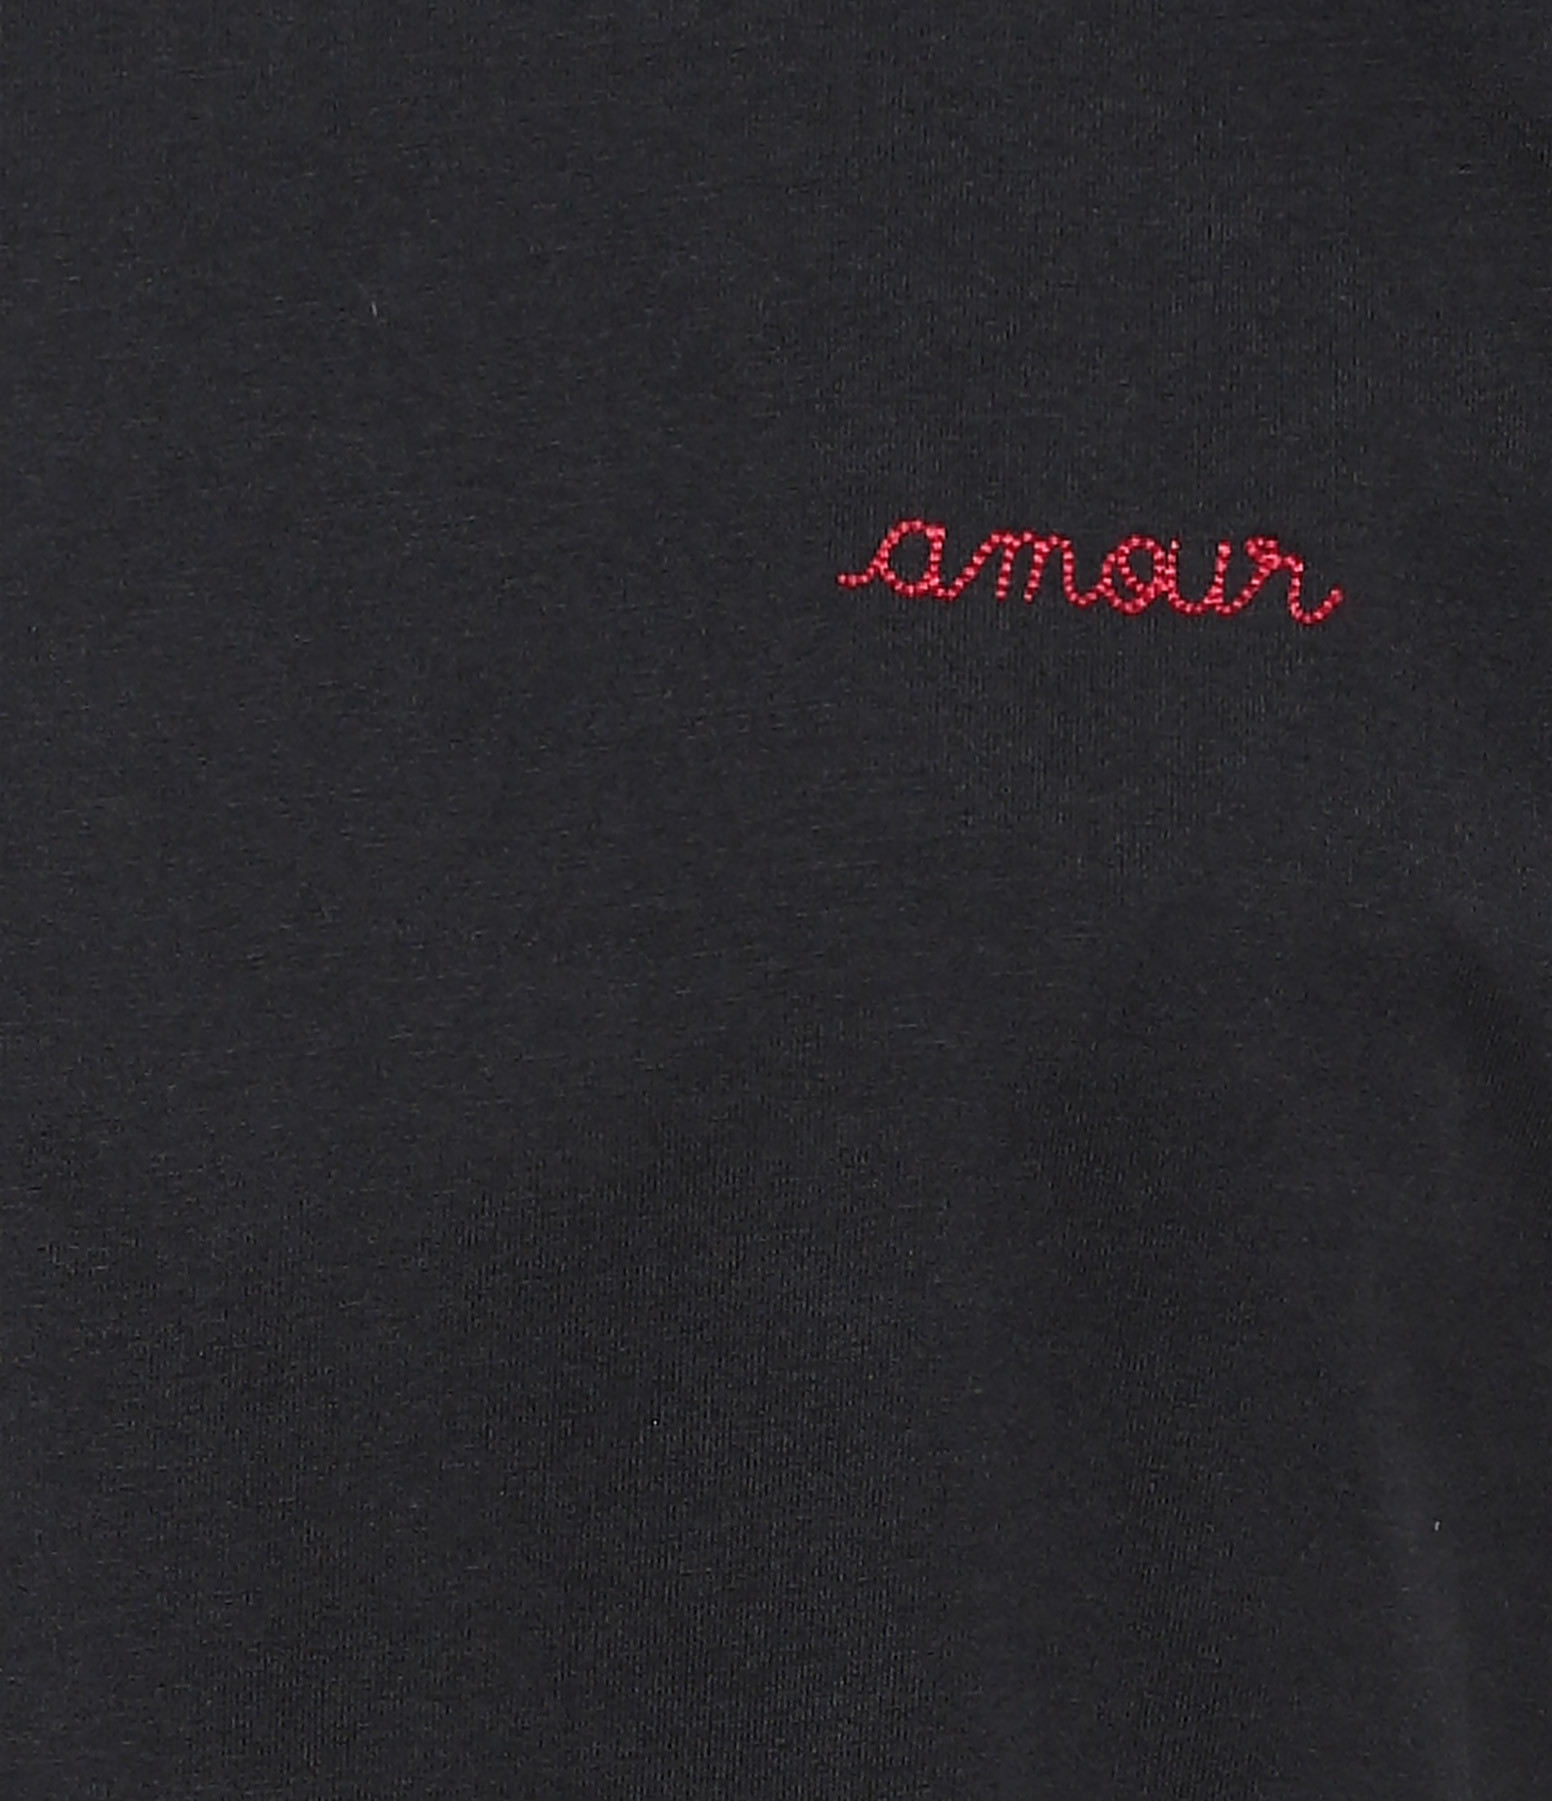 MAISON LABICHE - Tee-shirt Amour Noir